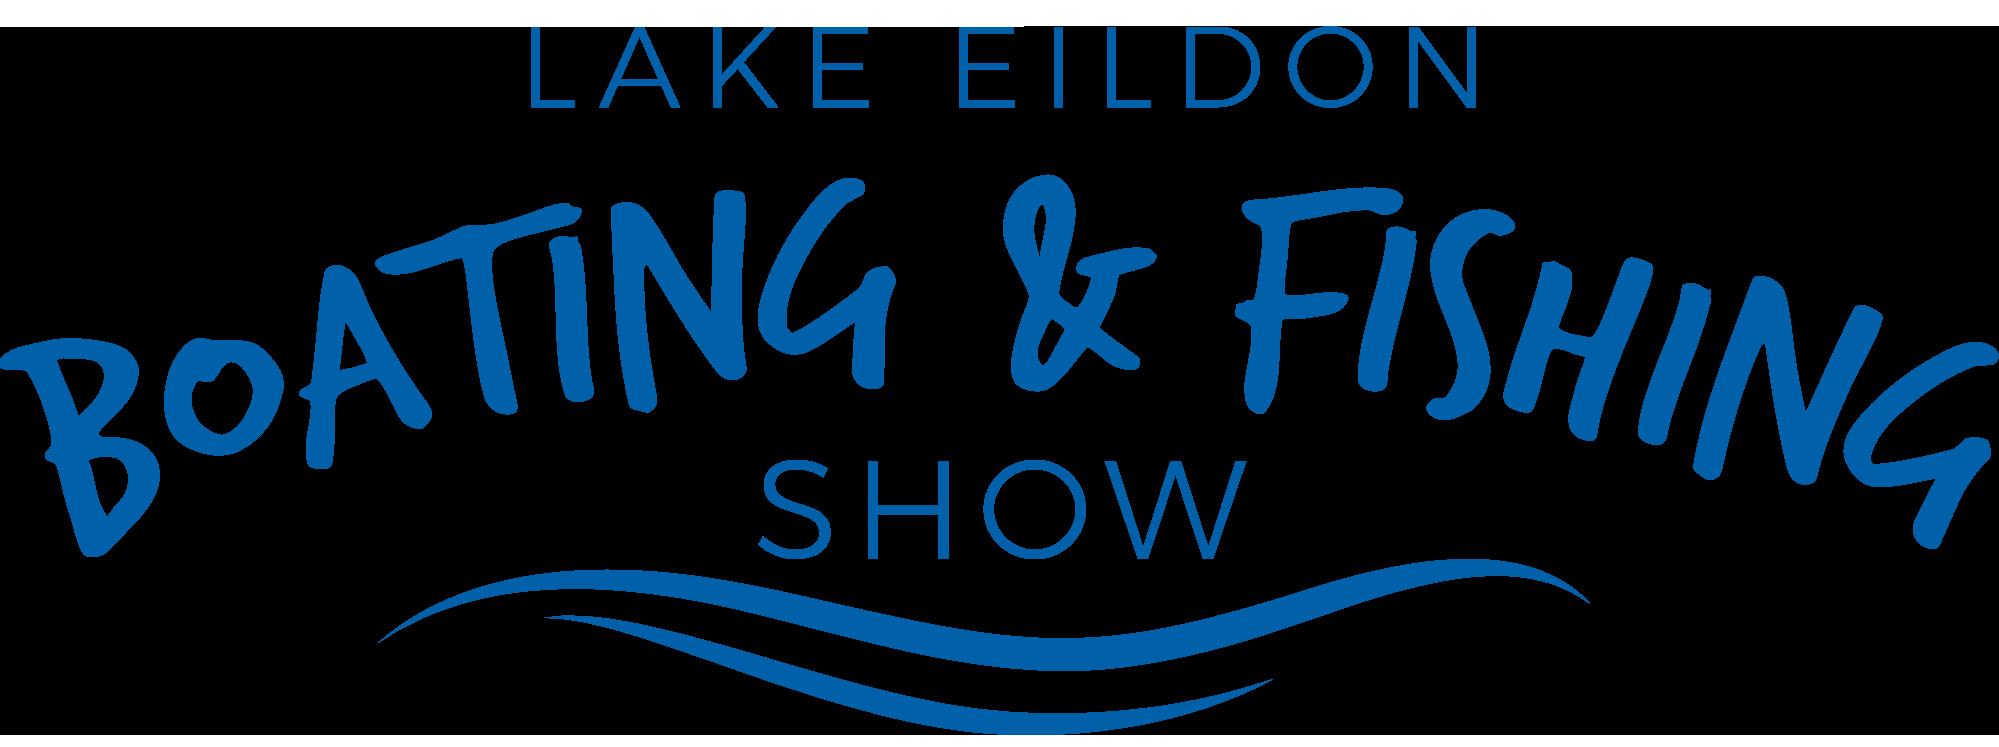 Lake Eildon Boat Show_Blue.png